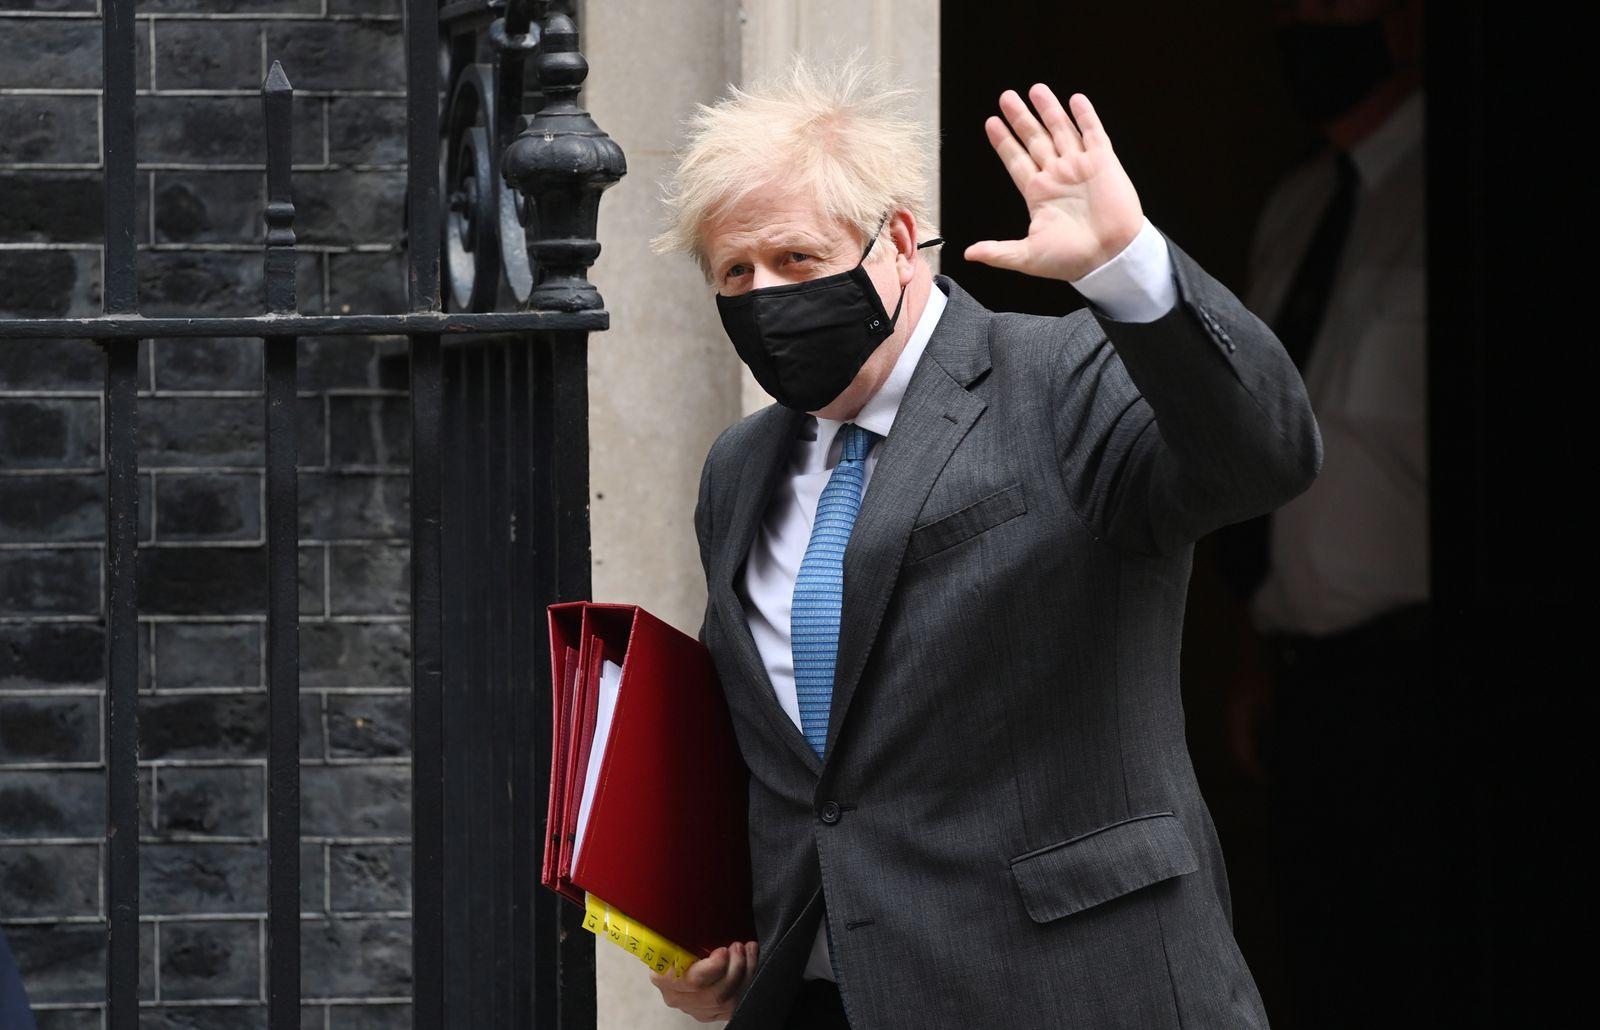 Prime Minister Boris Johnson under pressure following sleaze allegations